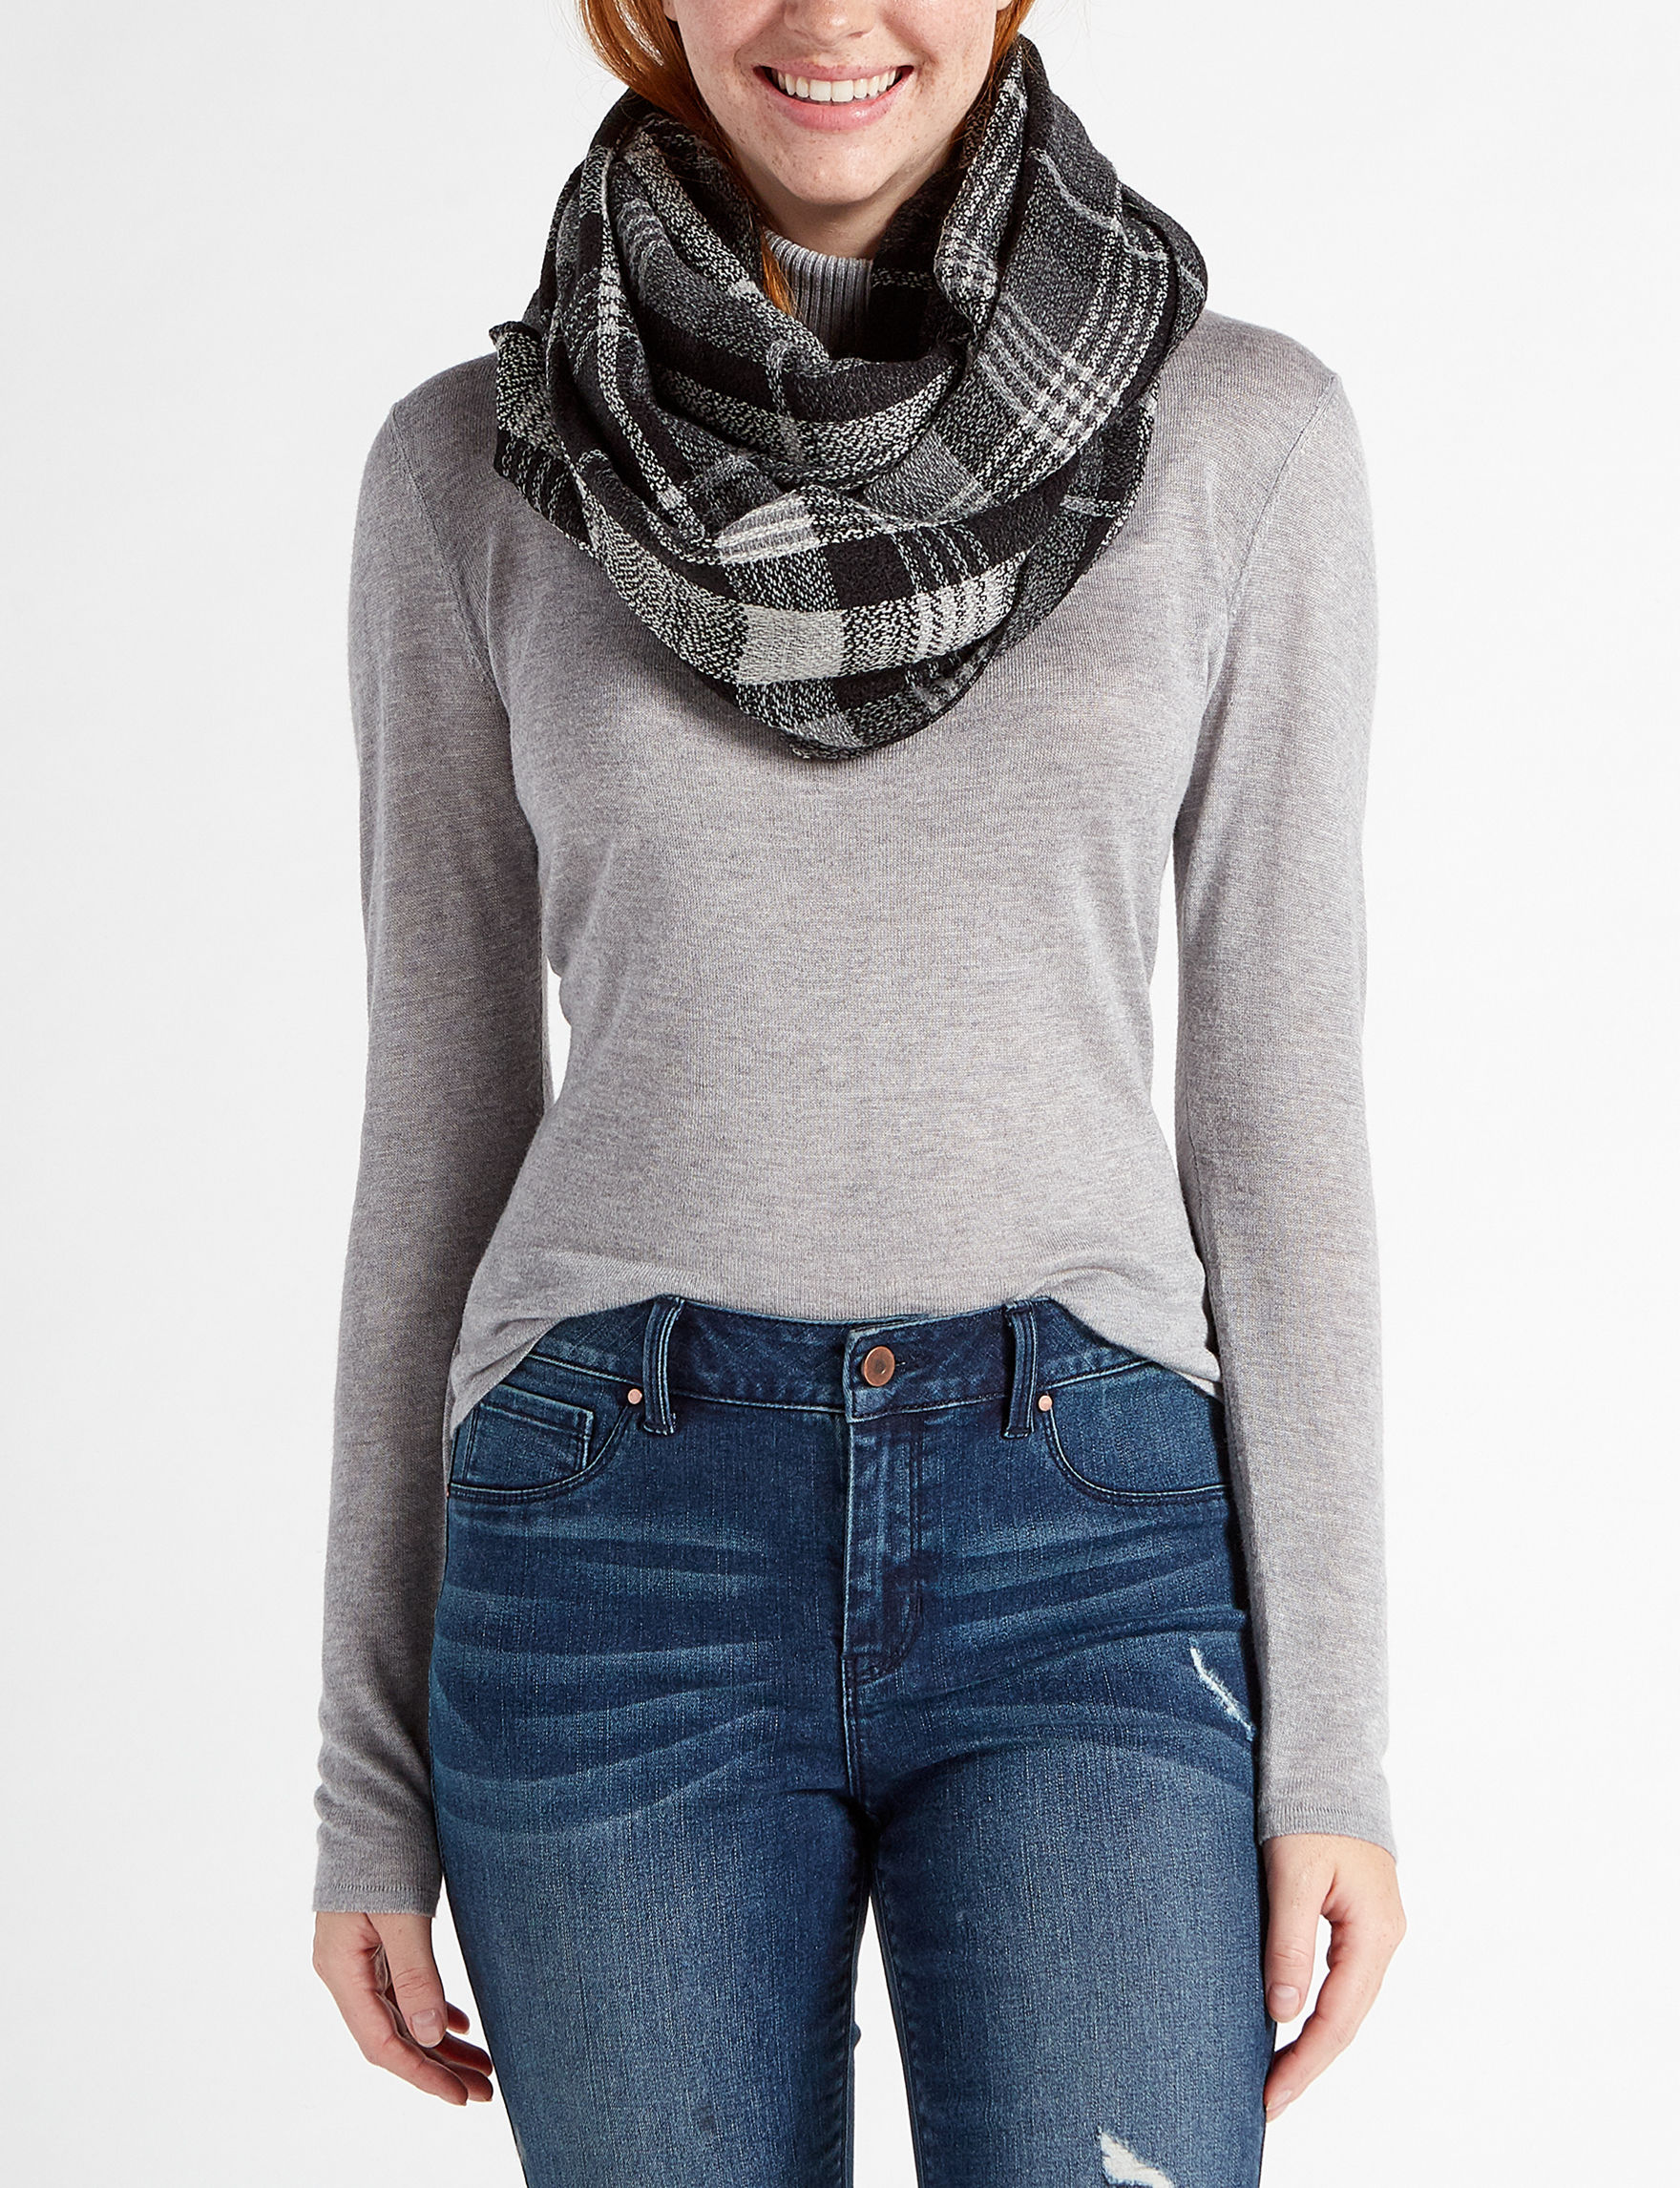 Modena Black/Grey Scarves & Wraps